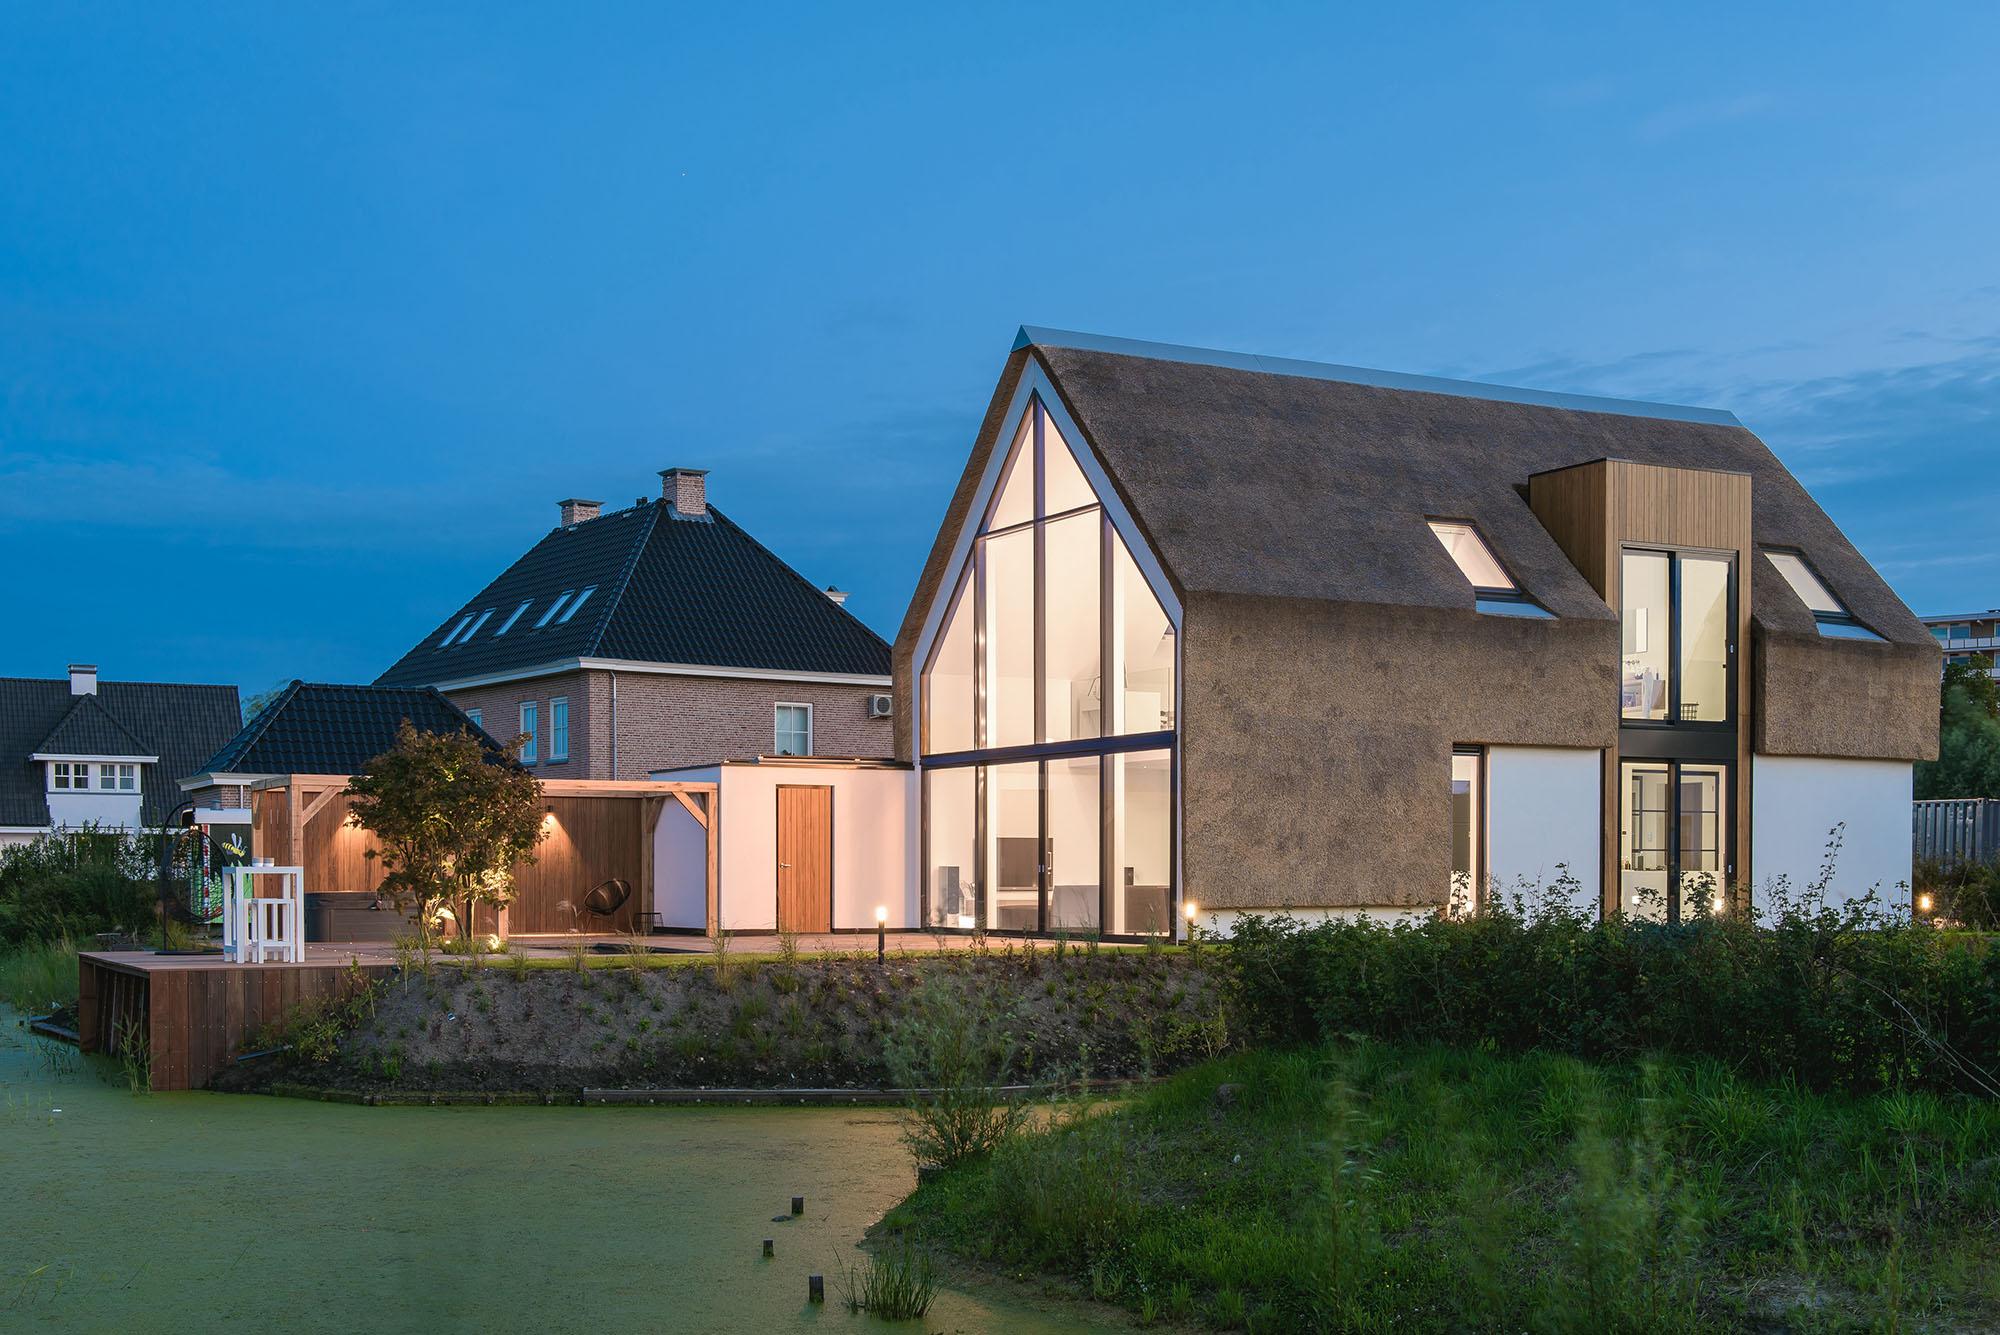 JURY-House008-rietendak-vliesgevel-modern-06